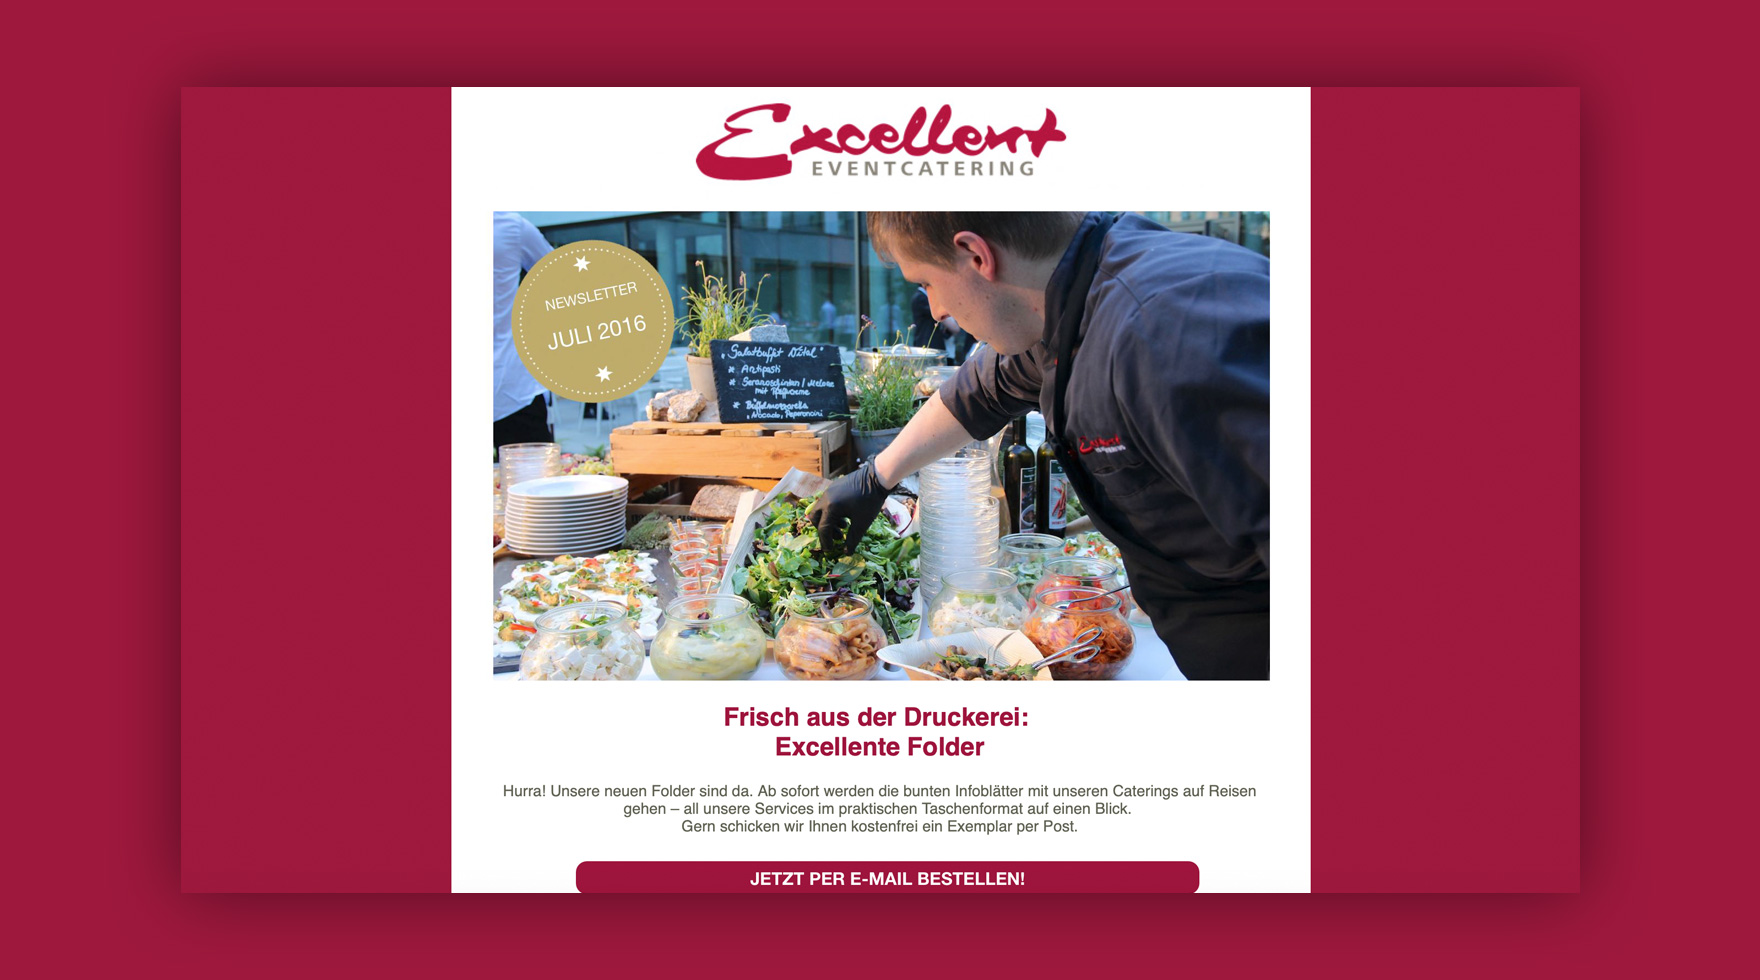 designer-newsletter-event-catering-berlin